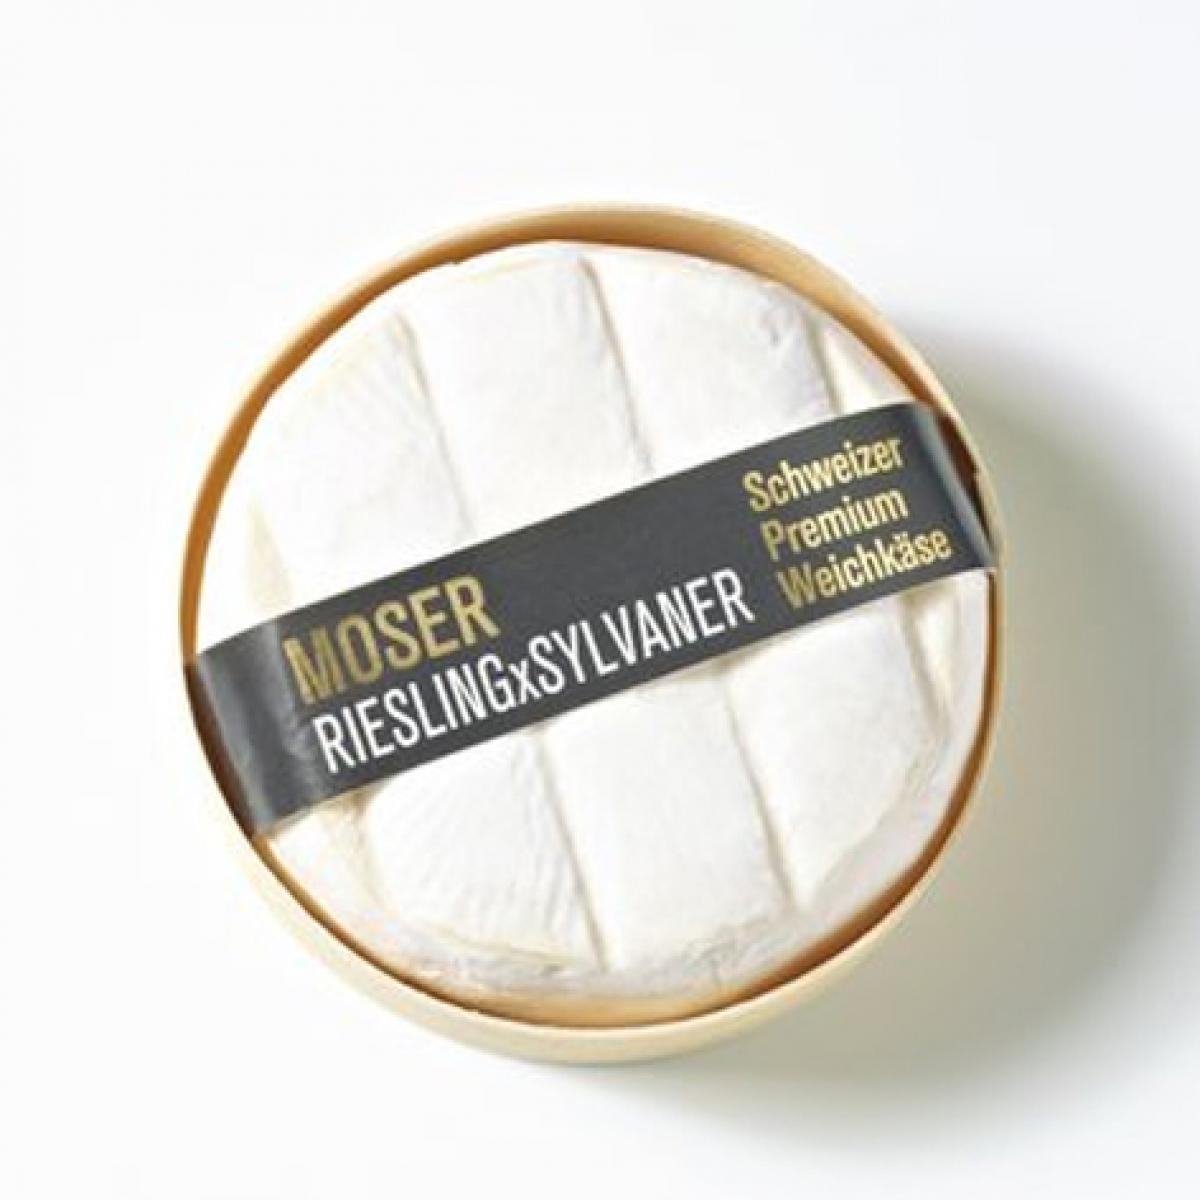 Moser Riesling Sylvaner